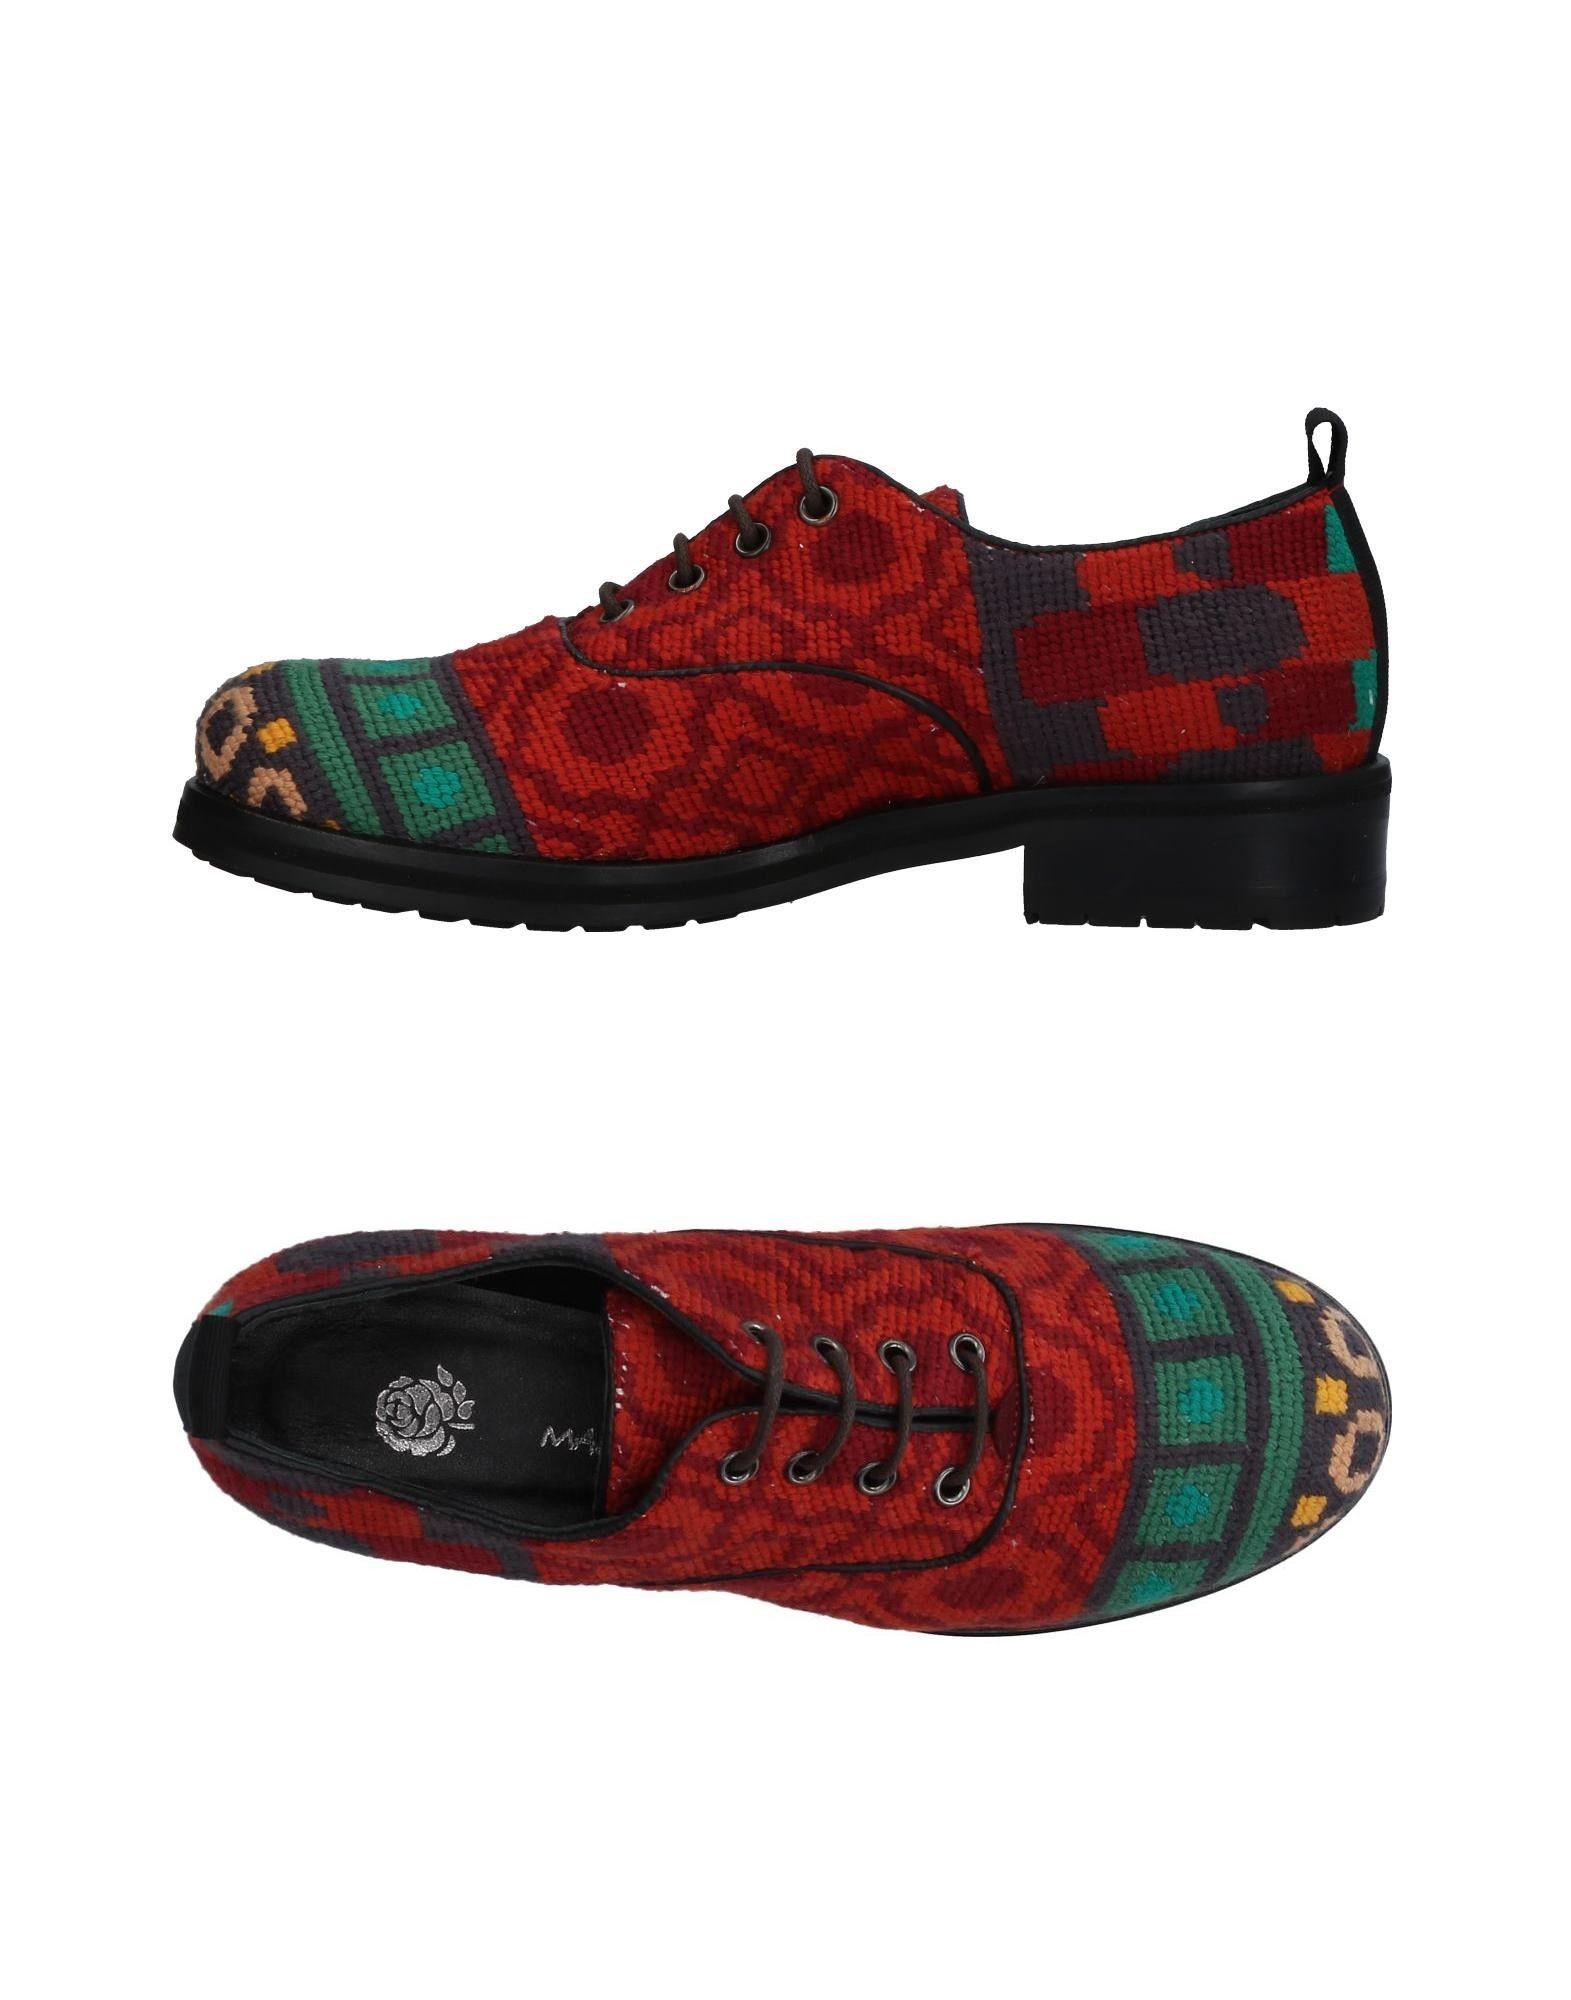 Фото - MALÌPARMI Обувь на шнурках обувь на высокой платформе dkny